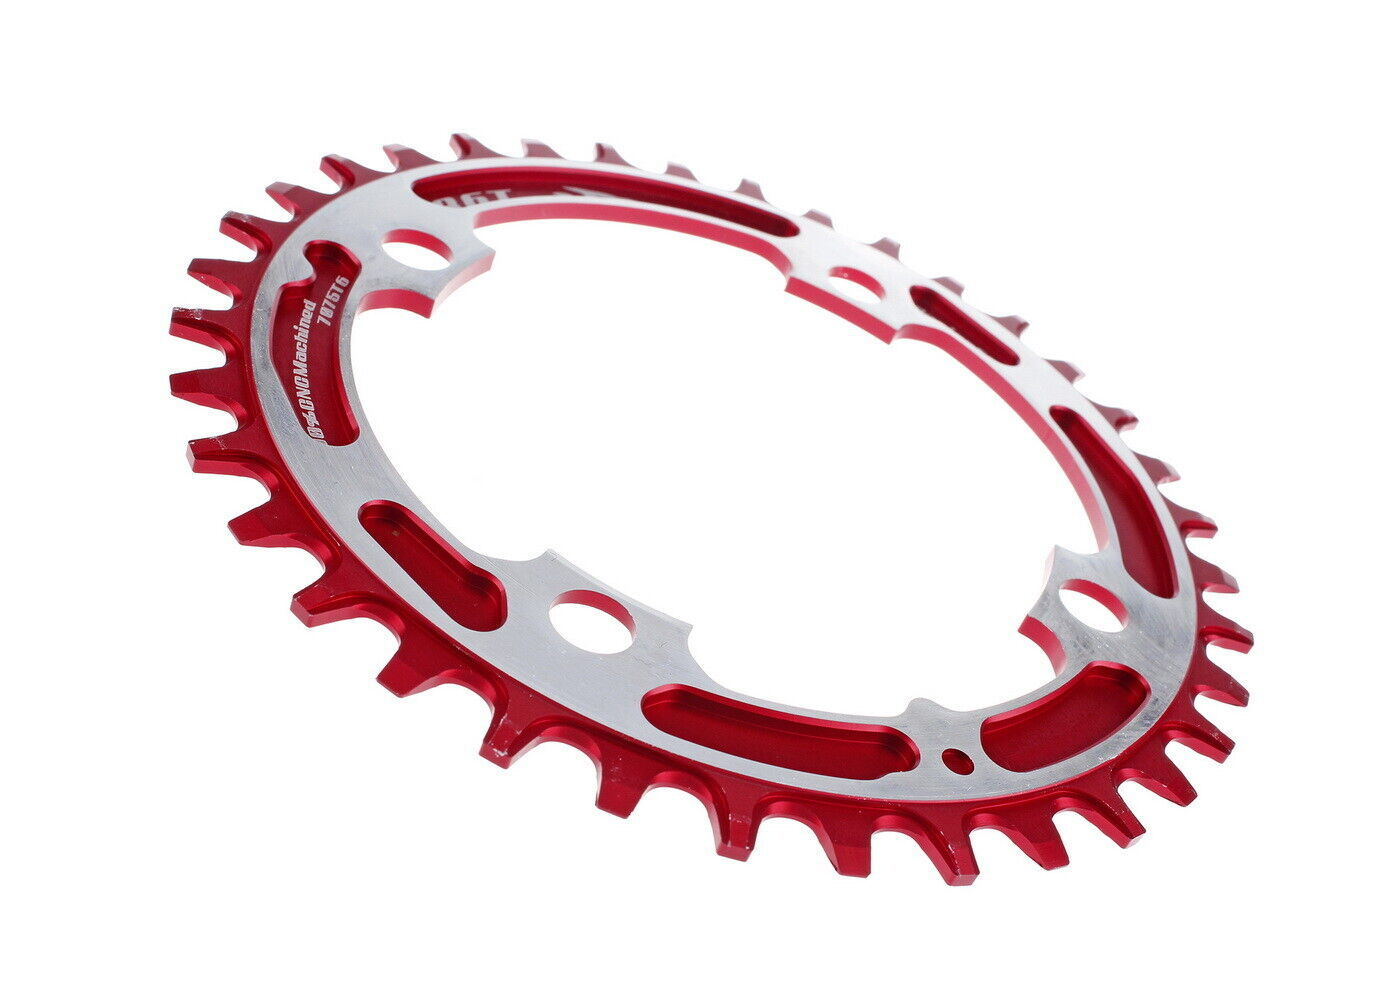 Aerozine Xone Mountain Bicycle Bike Single Chainring for Shimano Sram 36T Red